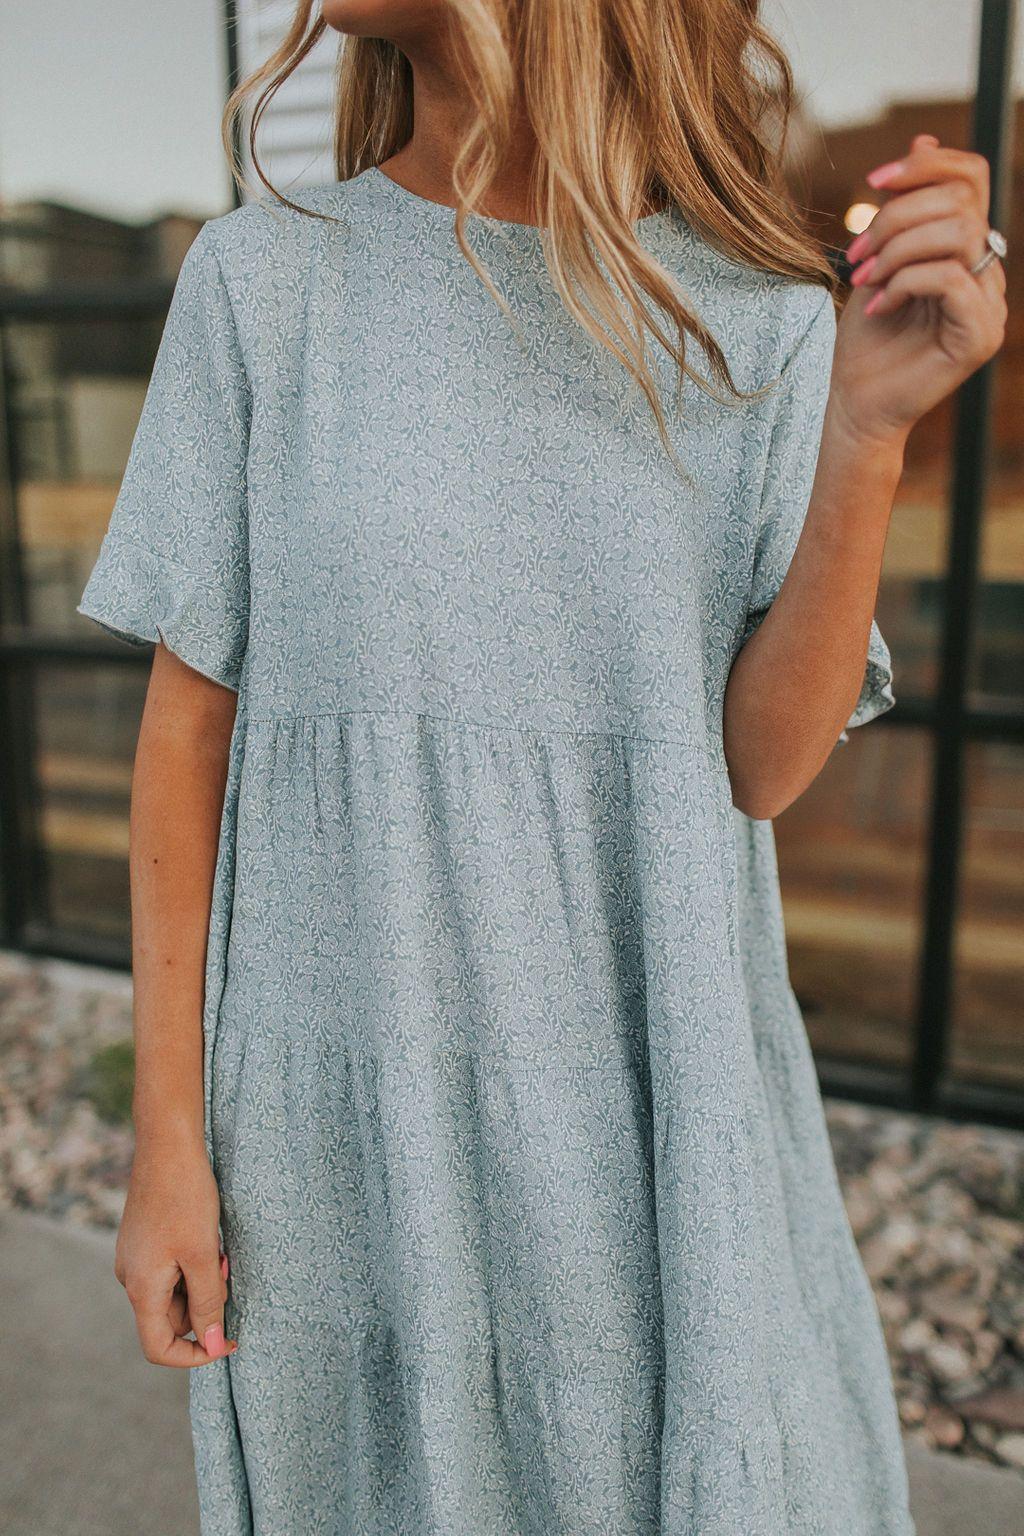 Lightweight Summer Dress Dresses Blue Dresses Stylish Leggings [ 1536 x 1024 Pixel ]